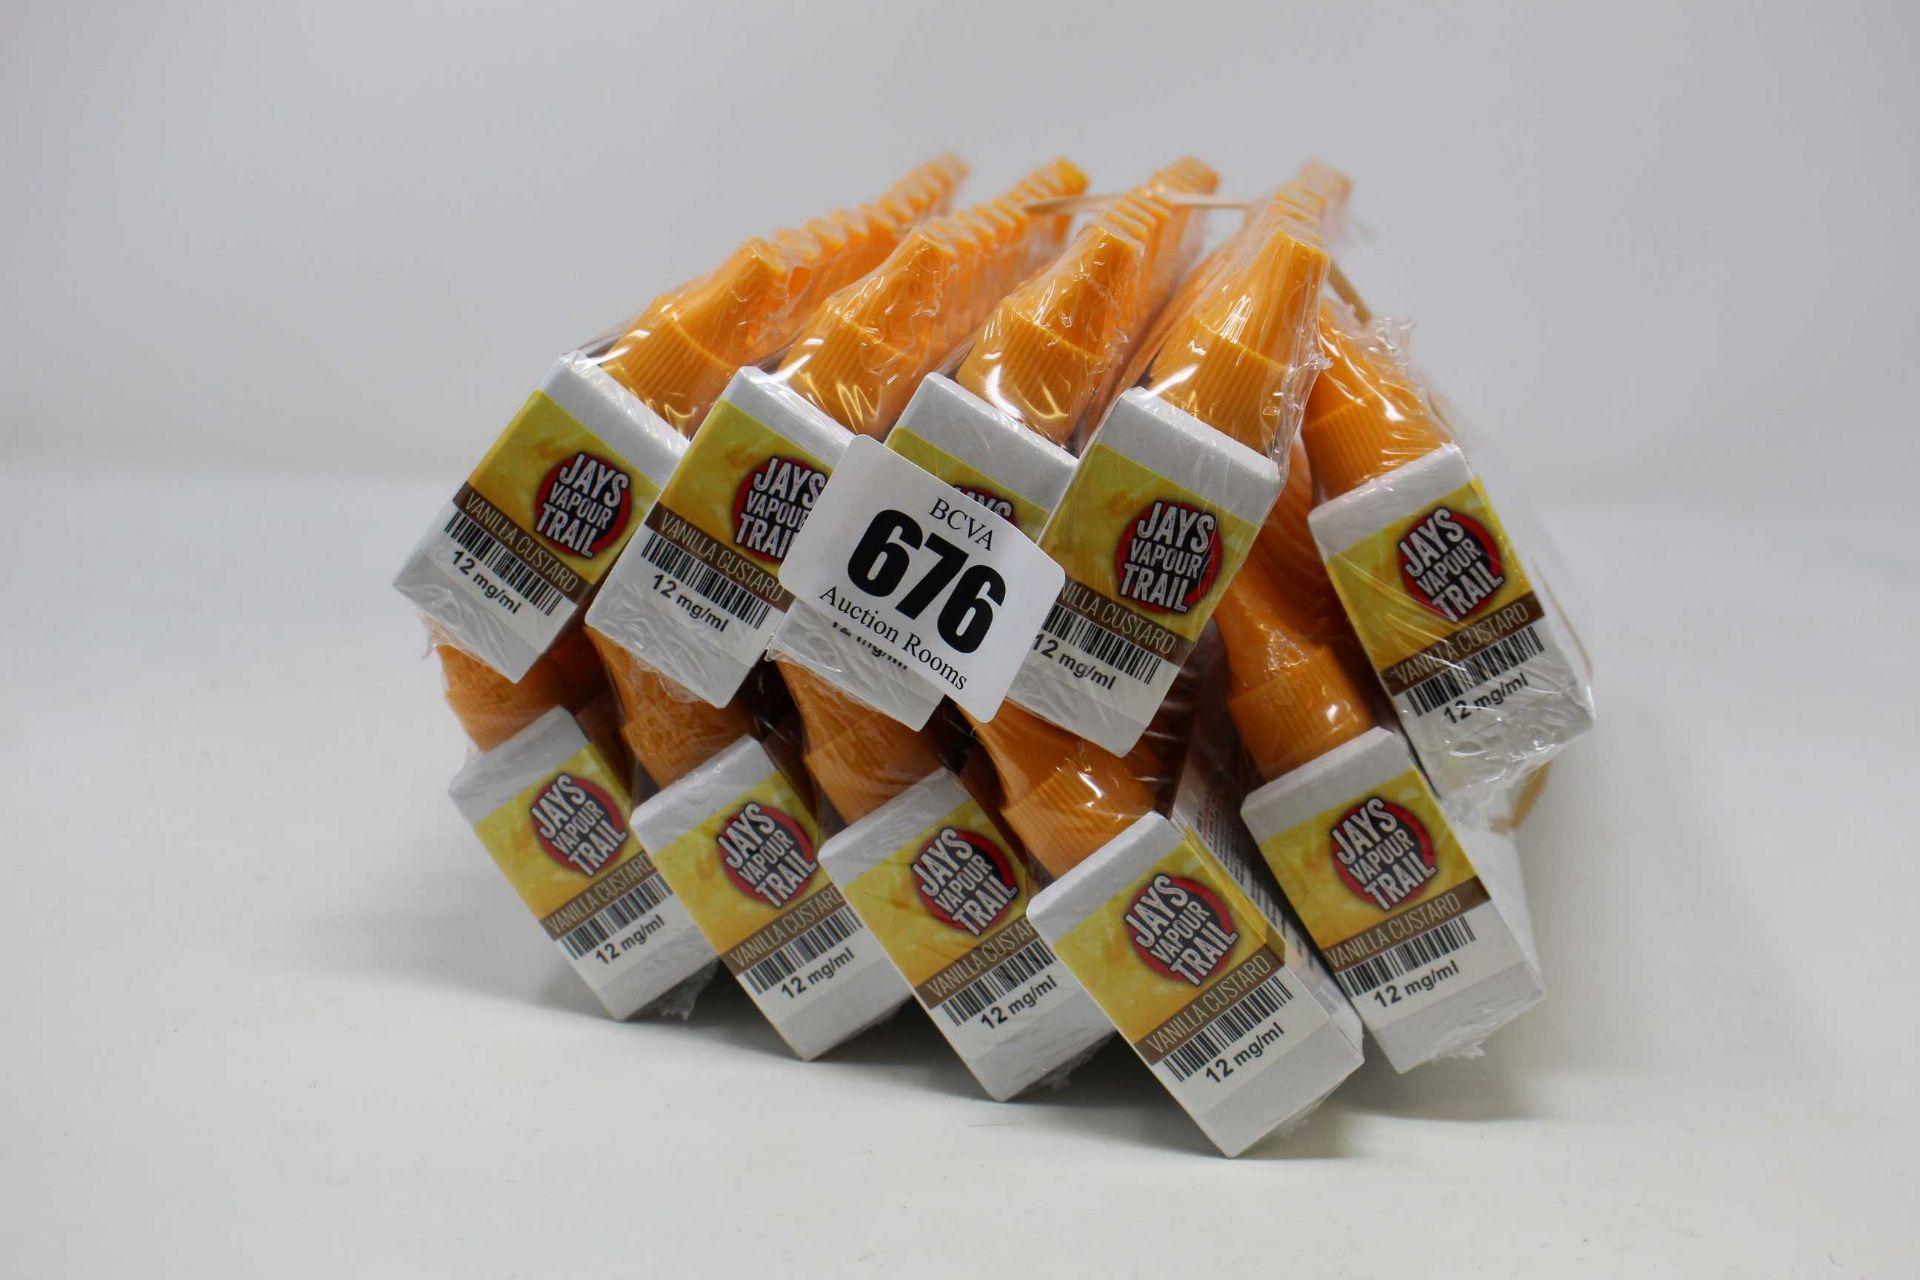 Ten packs of ten 10ml/12mg vape liquid in vanilla custard flavour (Over 18s only).